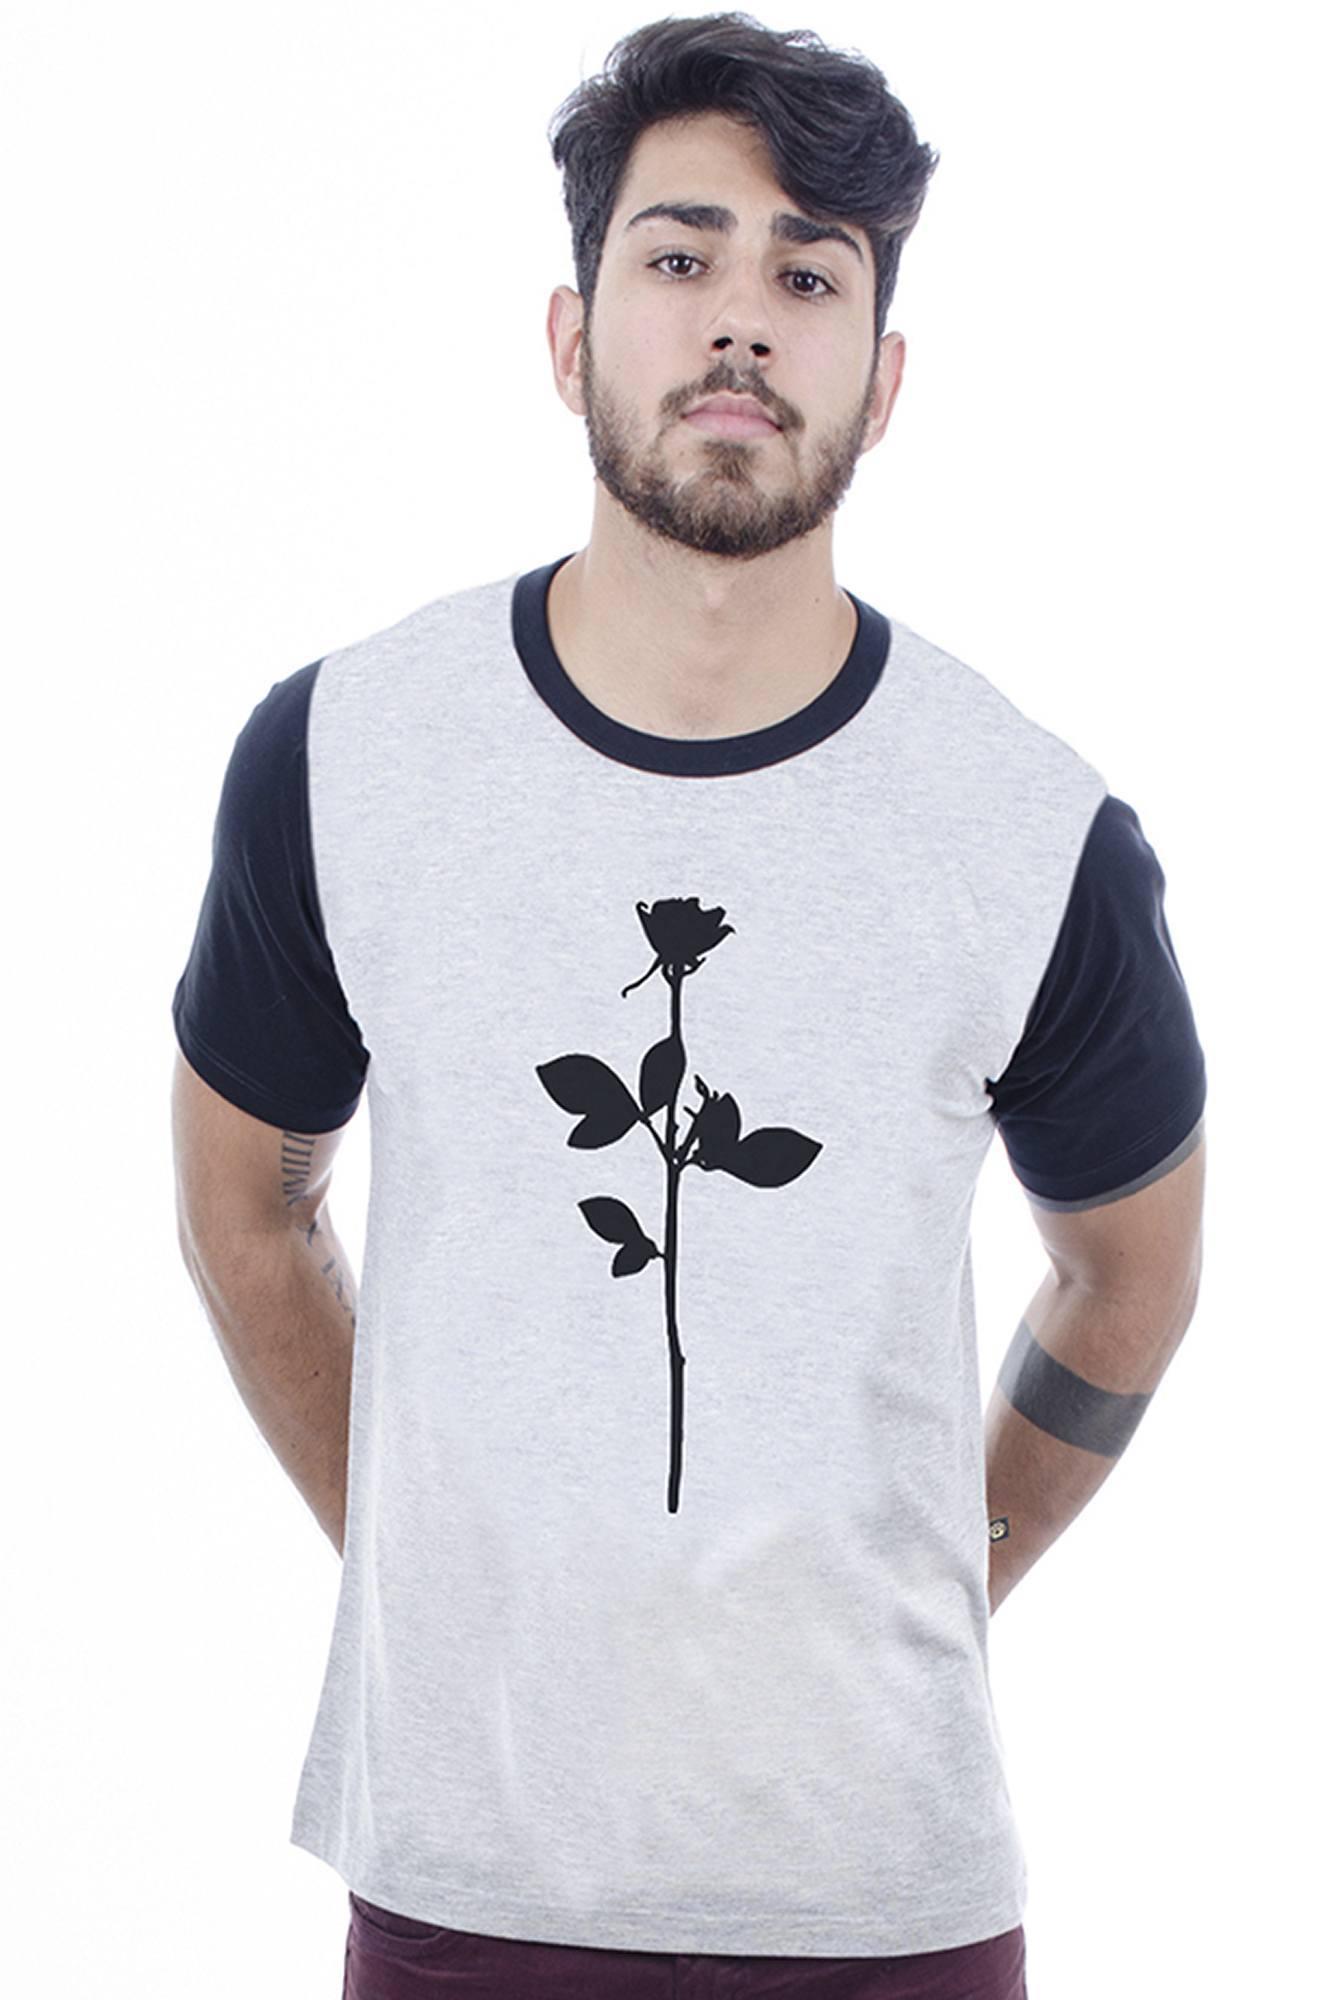 b29d816ce6 Camiseta Masculina estampada Silence Cinza Mescla Hardivision